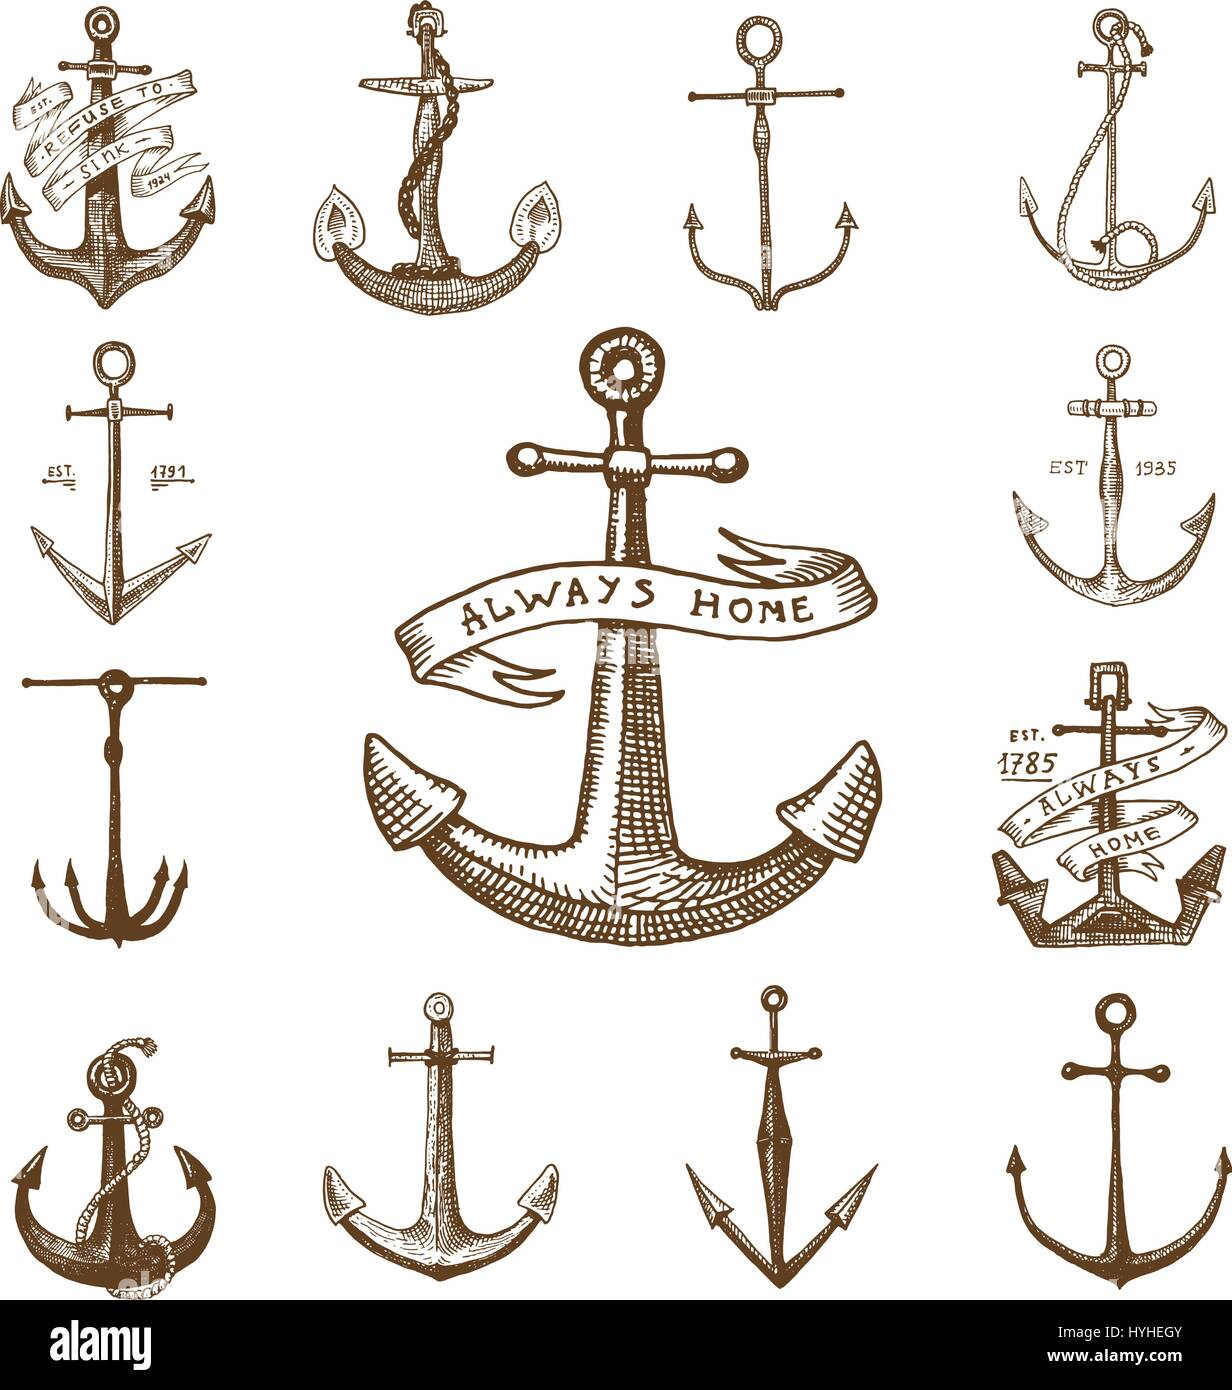 febdbfaeb Anchor engraved vintage in old hand drawn or tattoo style, drawing for  marine, aquatic or nautical theme, wood cut, blue logo.